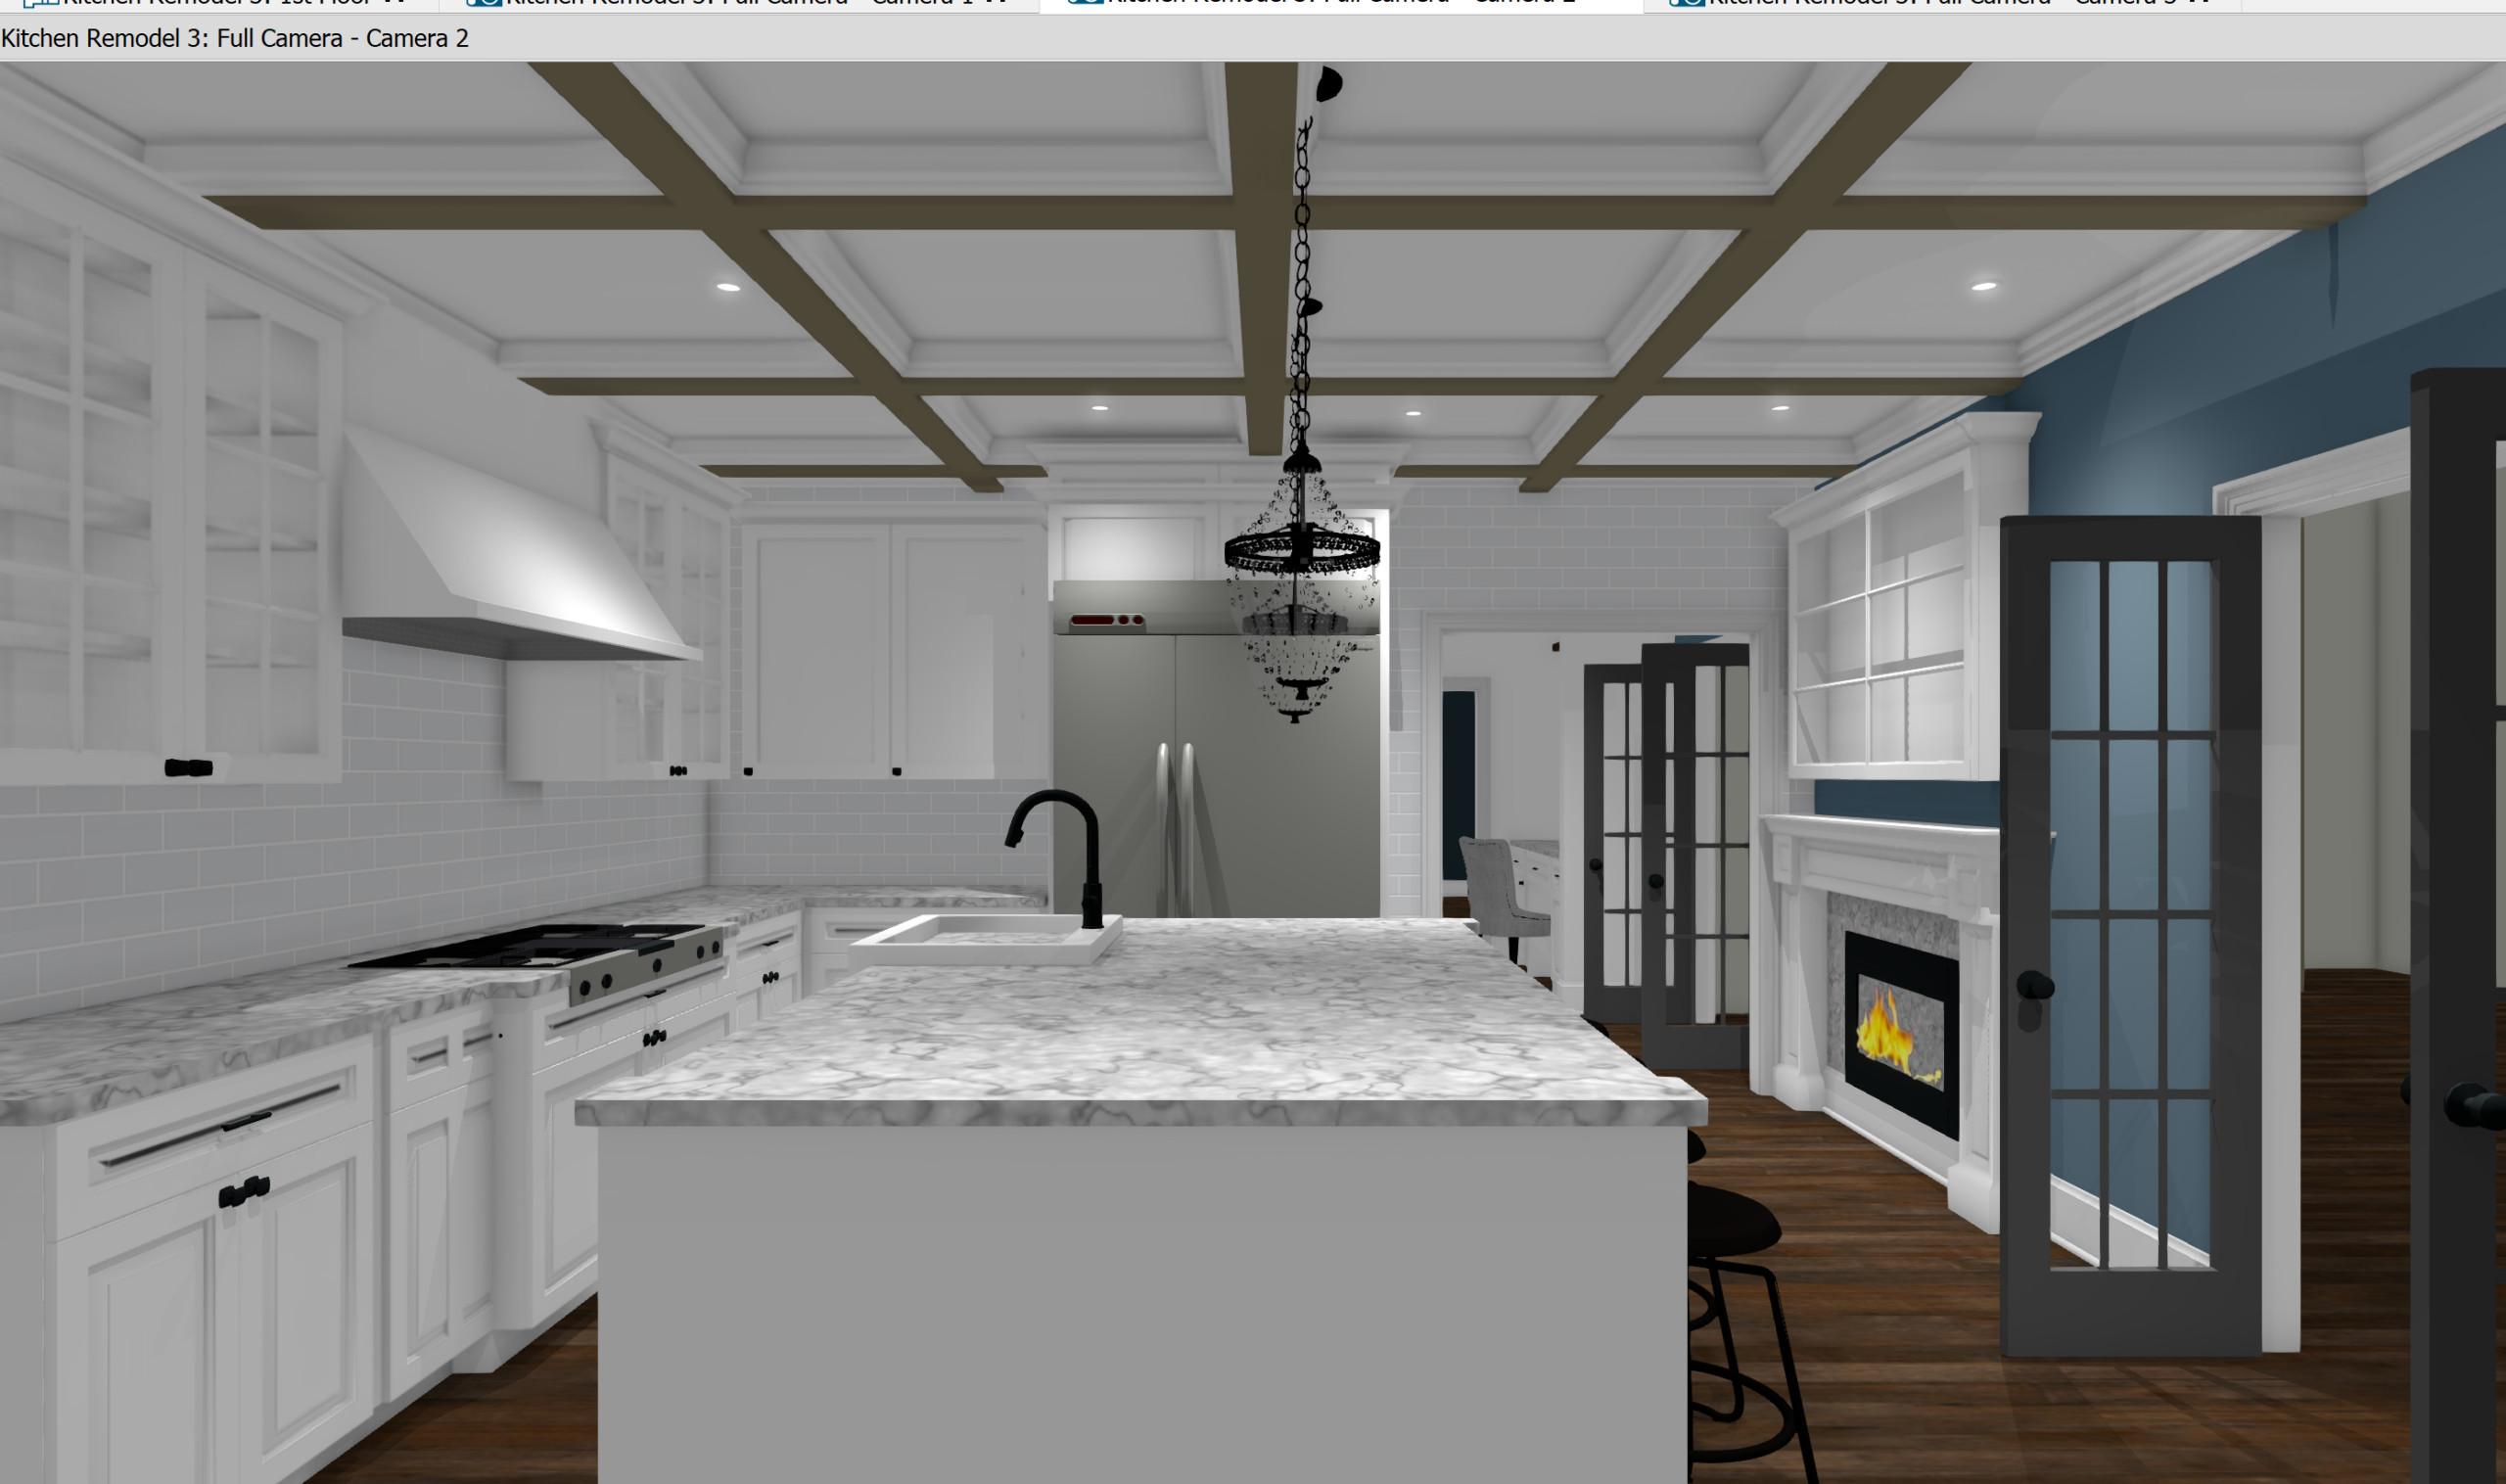 Conceptual Kitchen Design Ken Caryl Residence